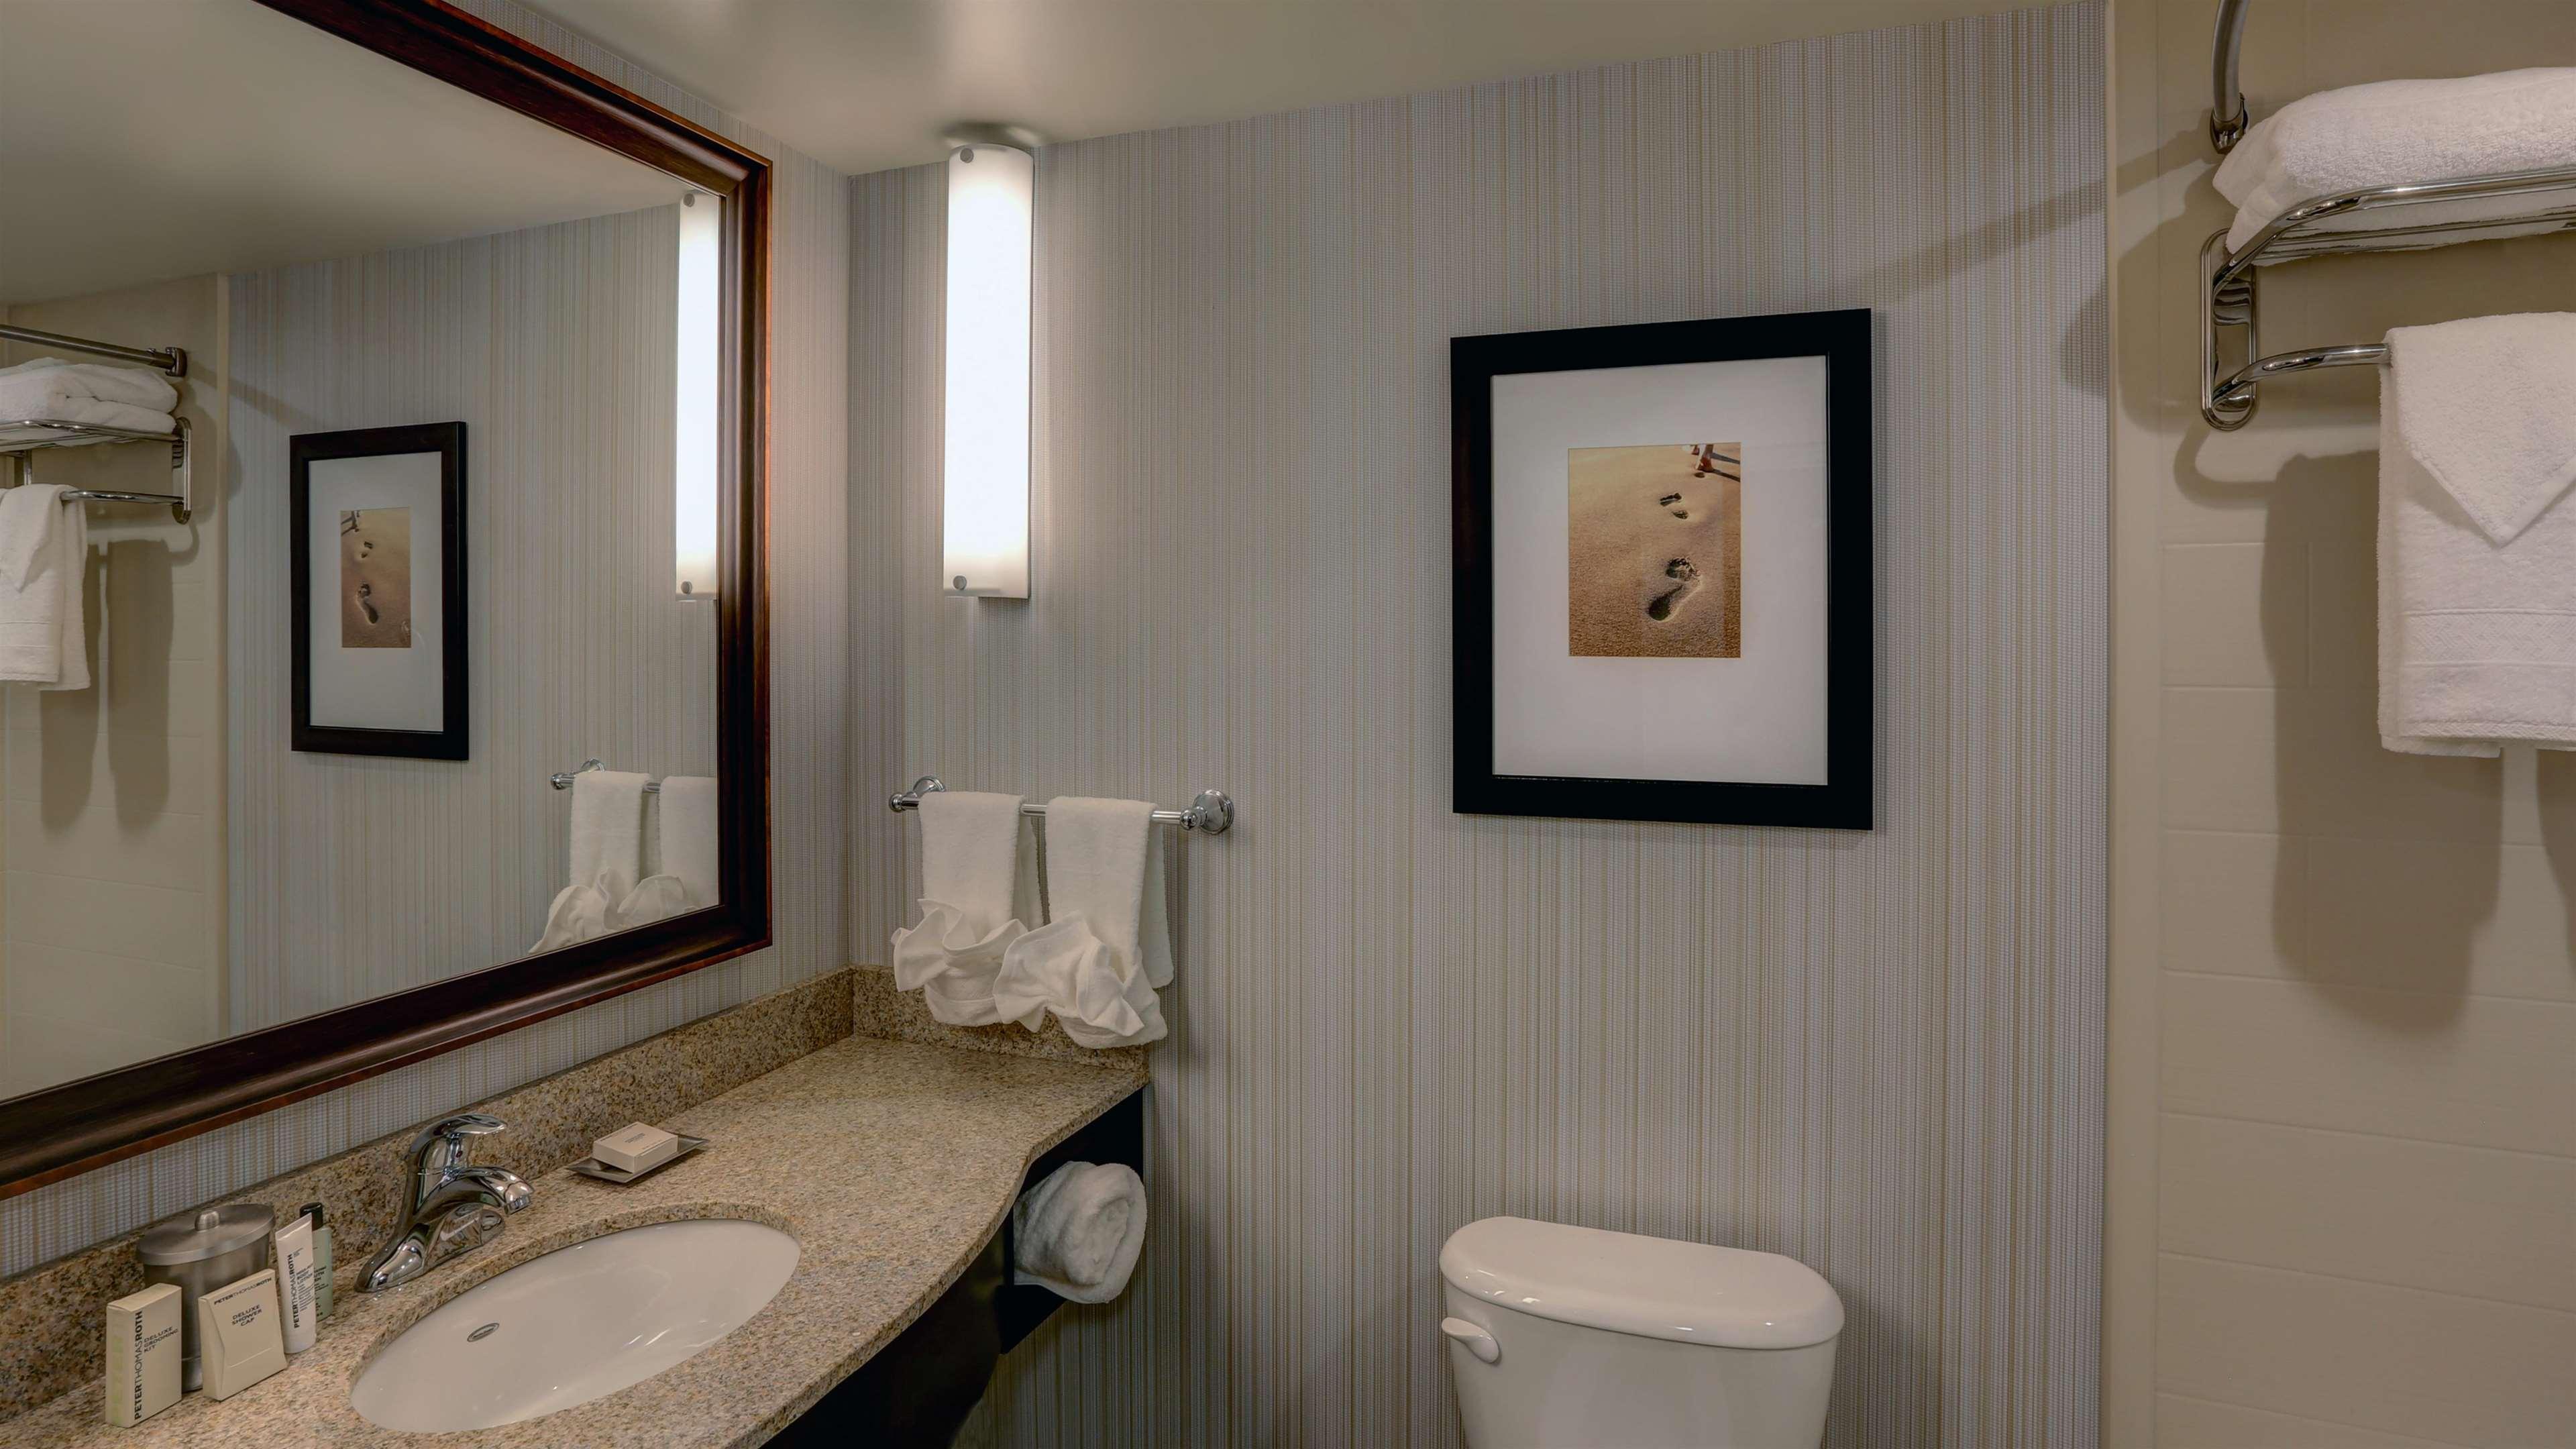 Hilton Garden Inn Virginia Beach Oceanfront image 29